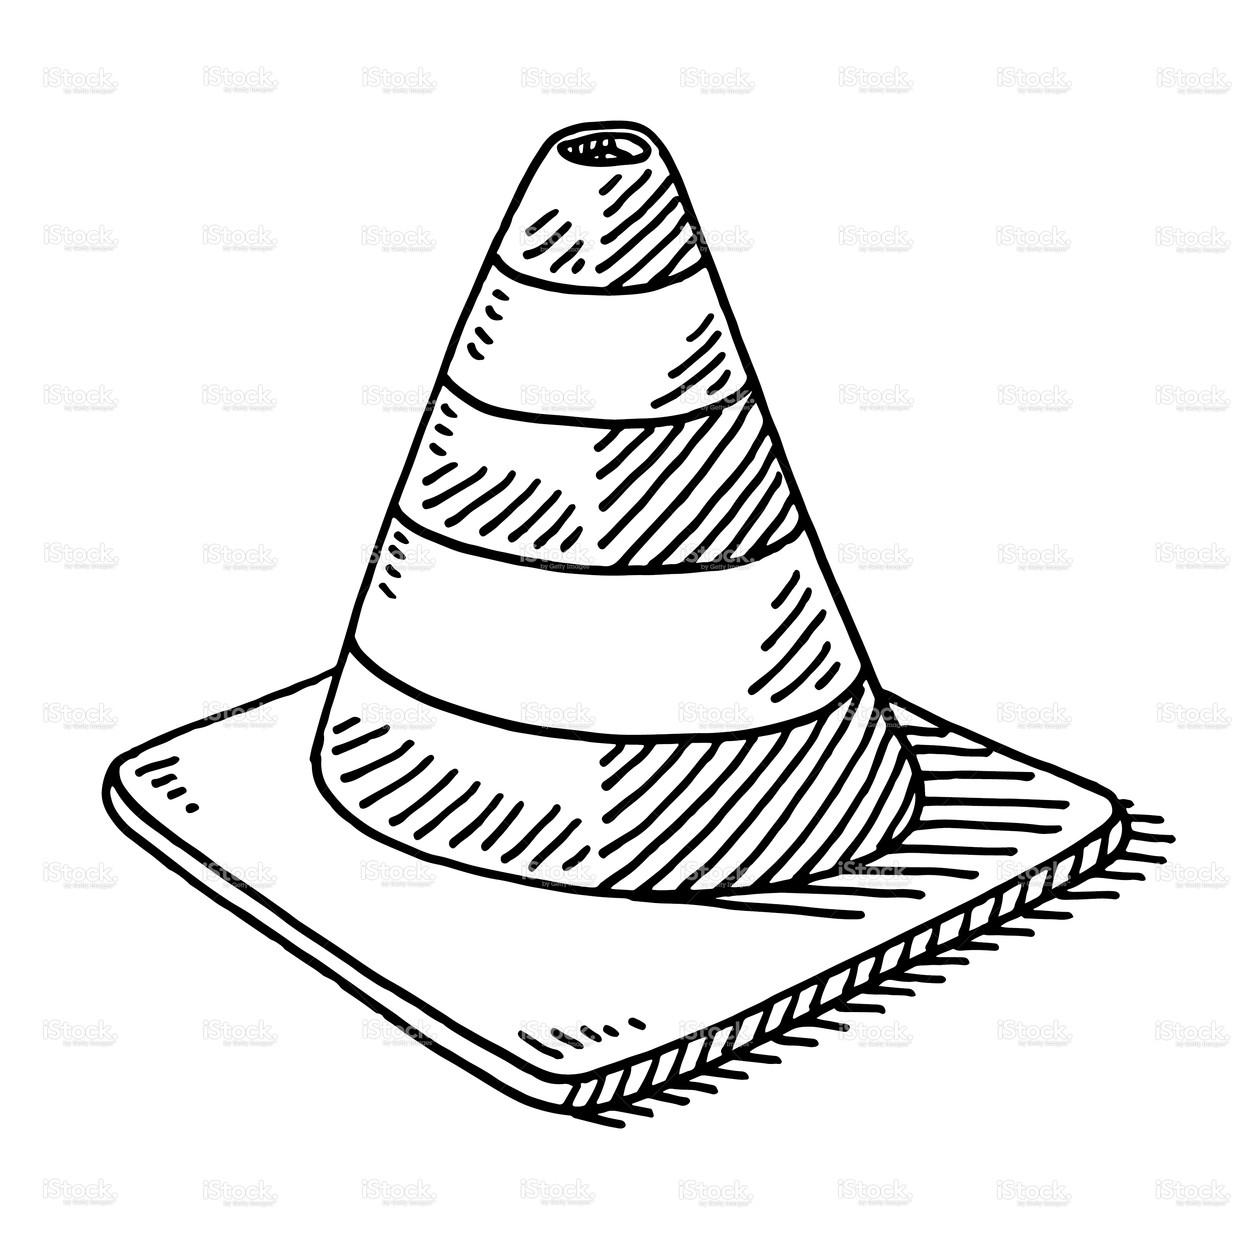 stock-illustration-42836684-traffic-cone-drawing - Dorris and Associates